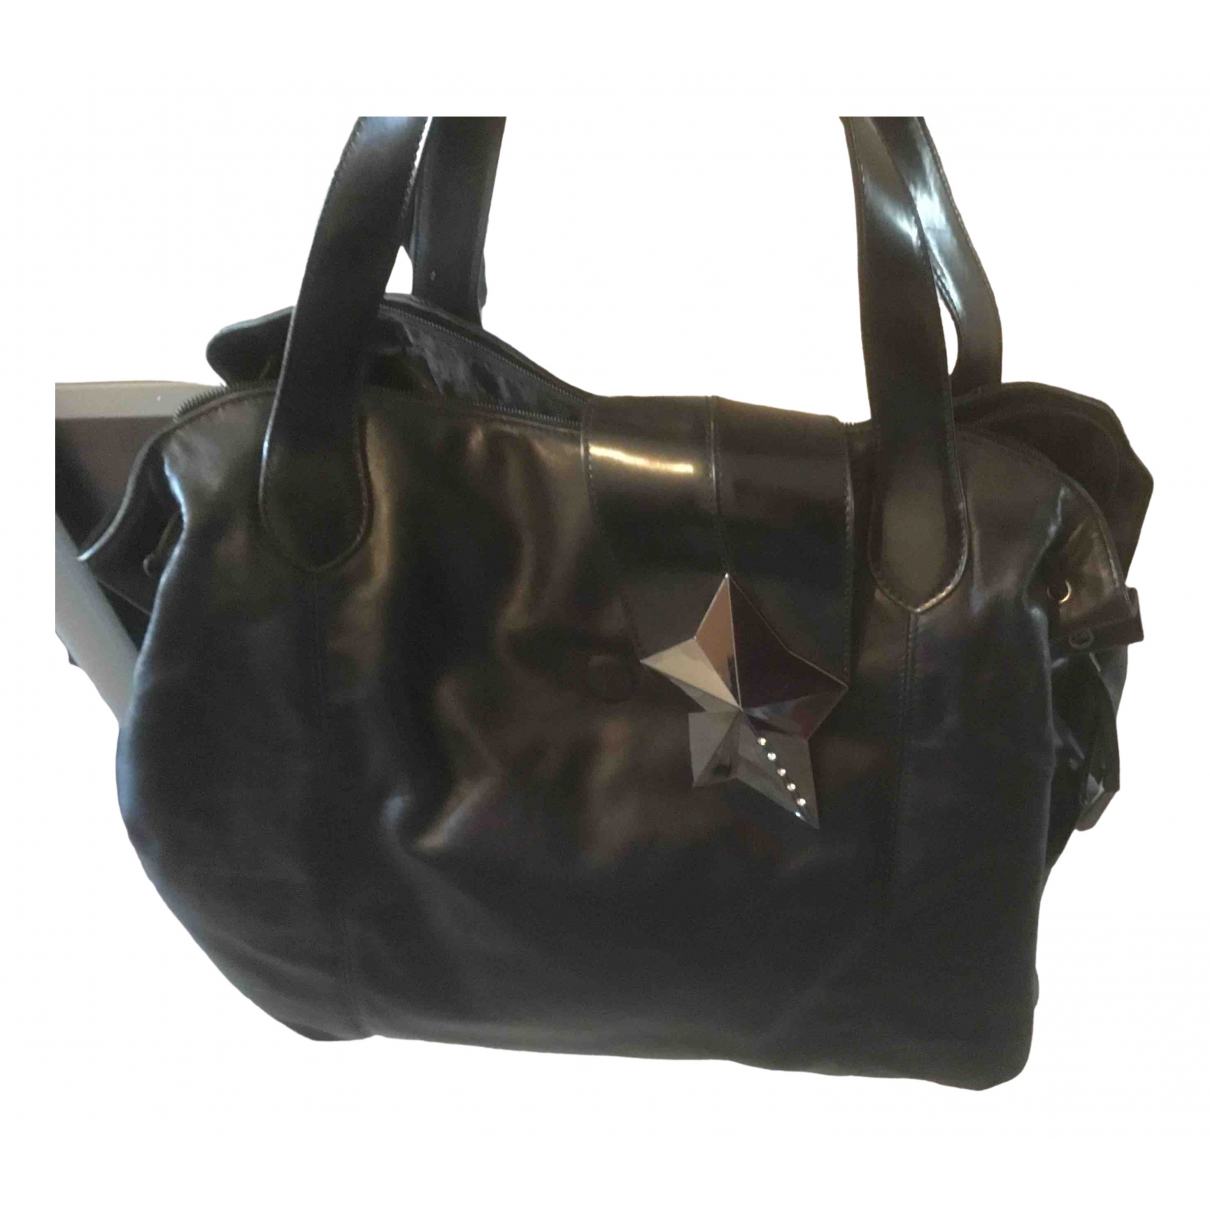 Thierry Mugler - Sac a main   pour femme en cuir - noir